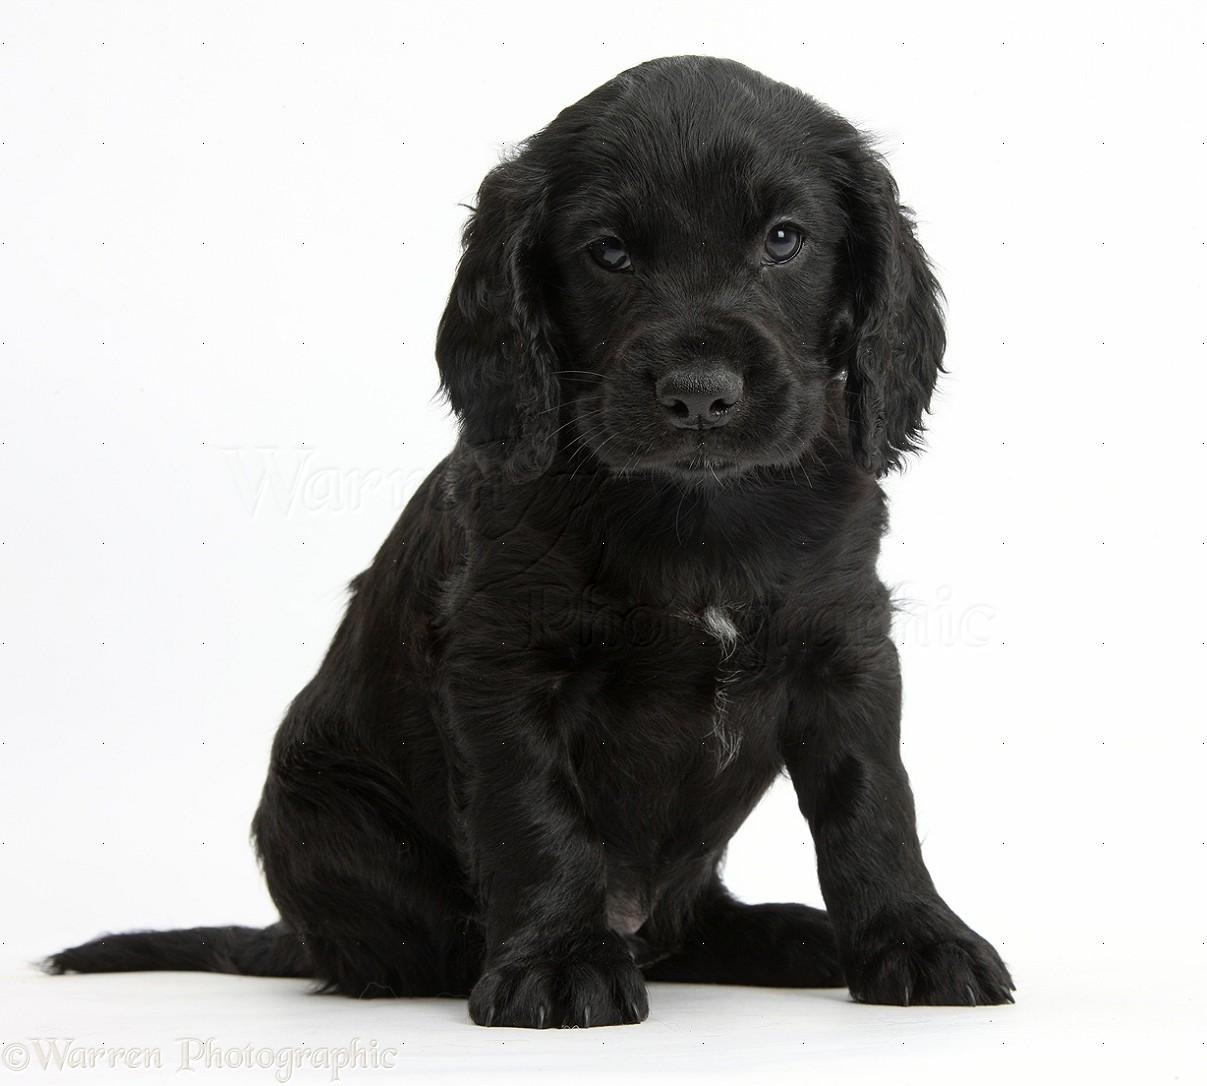 Black cocker spaniel puppies